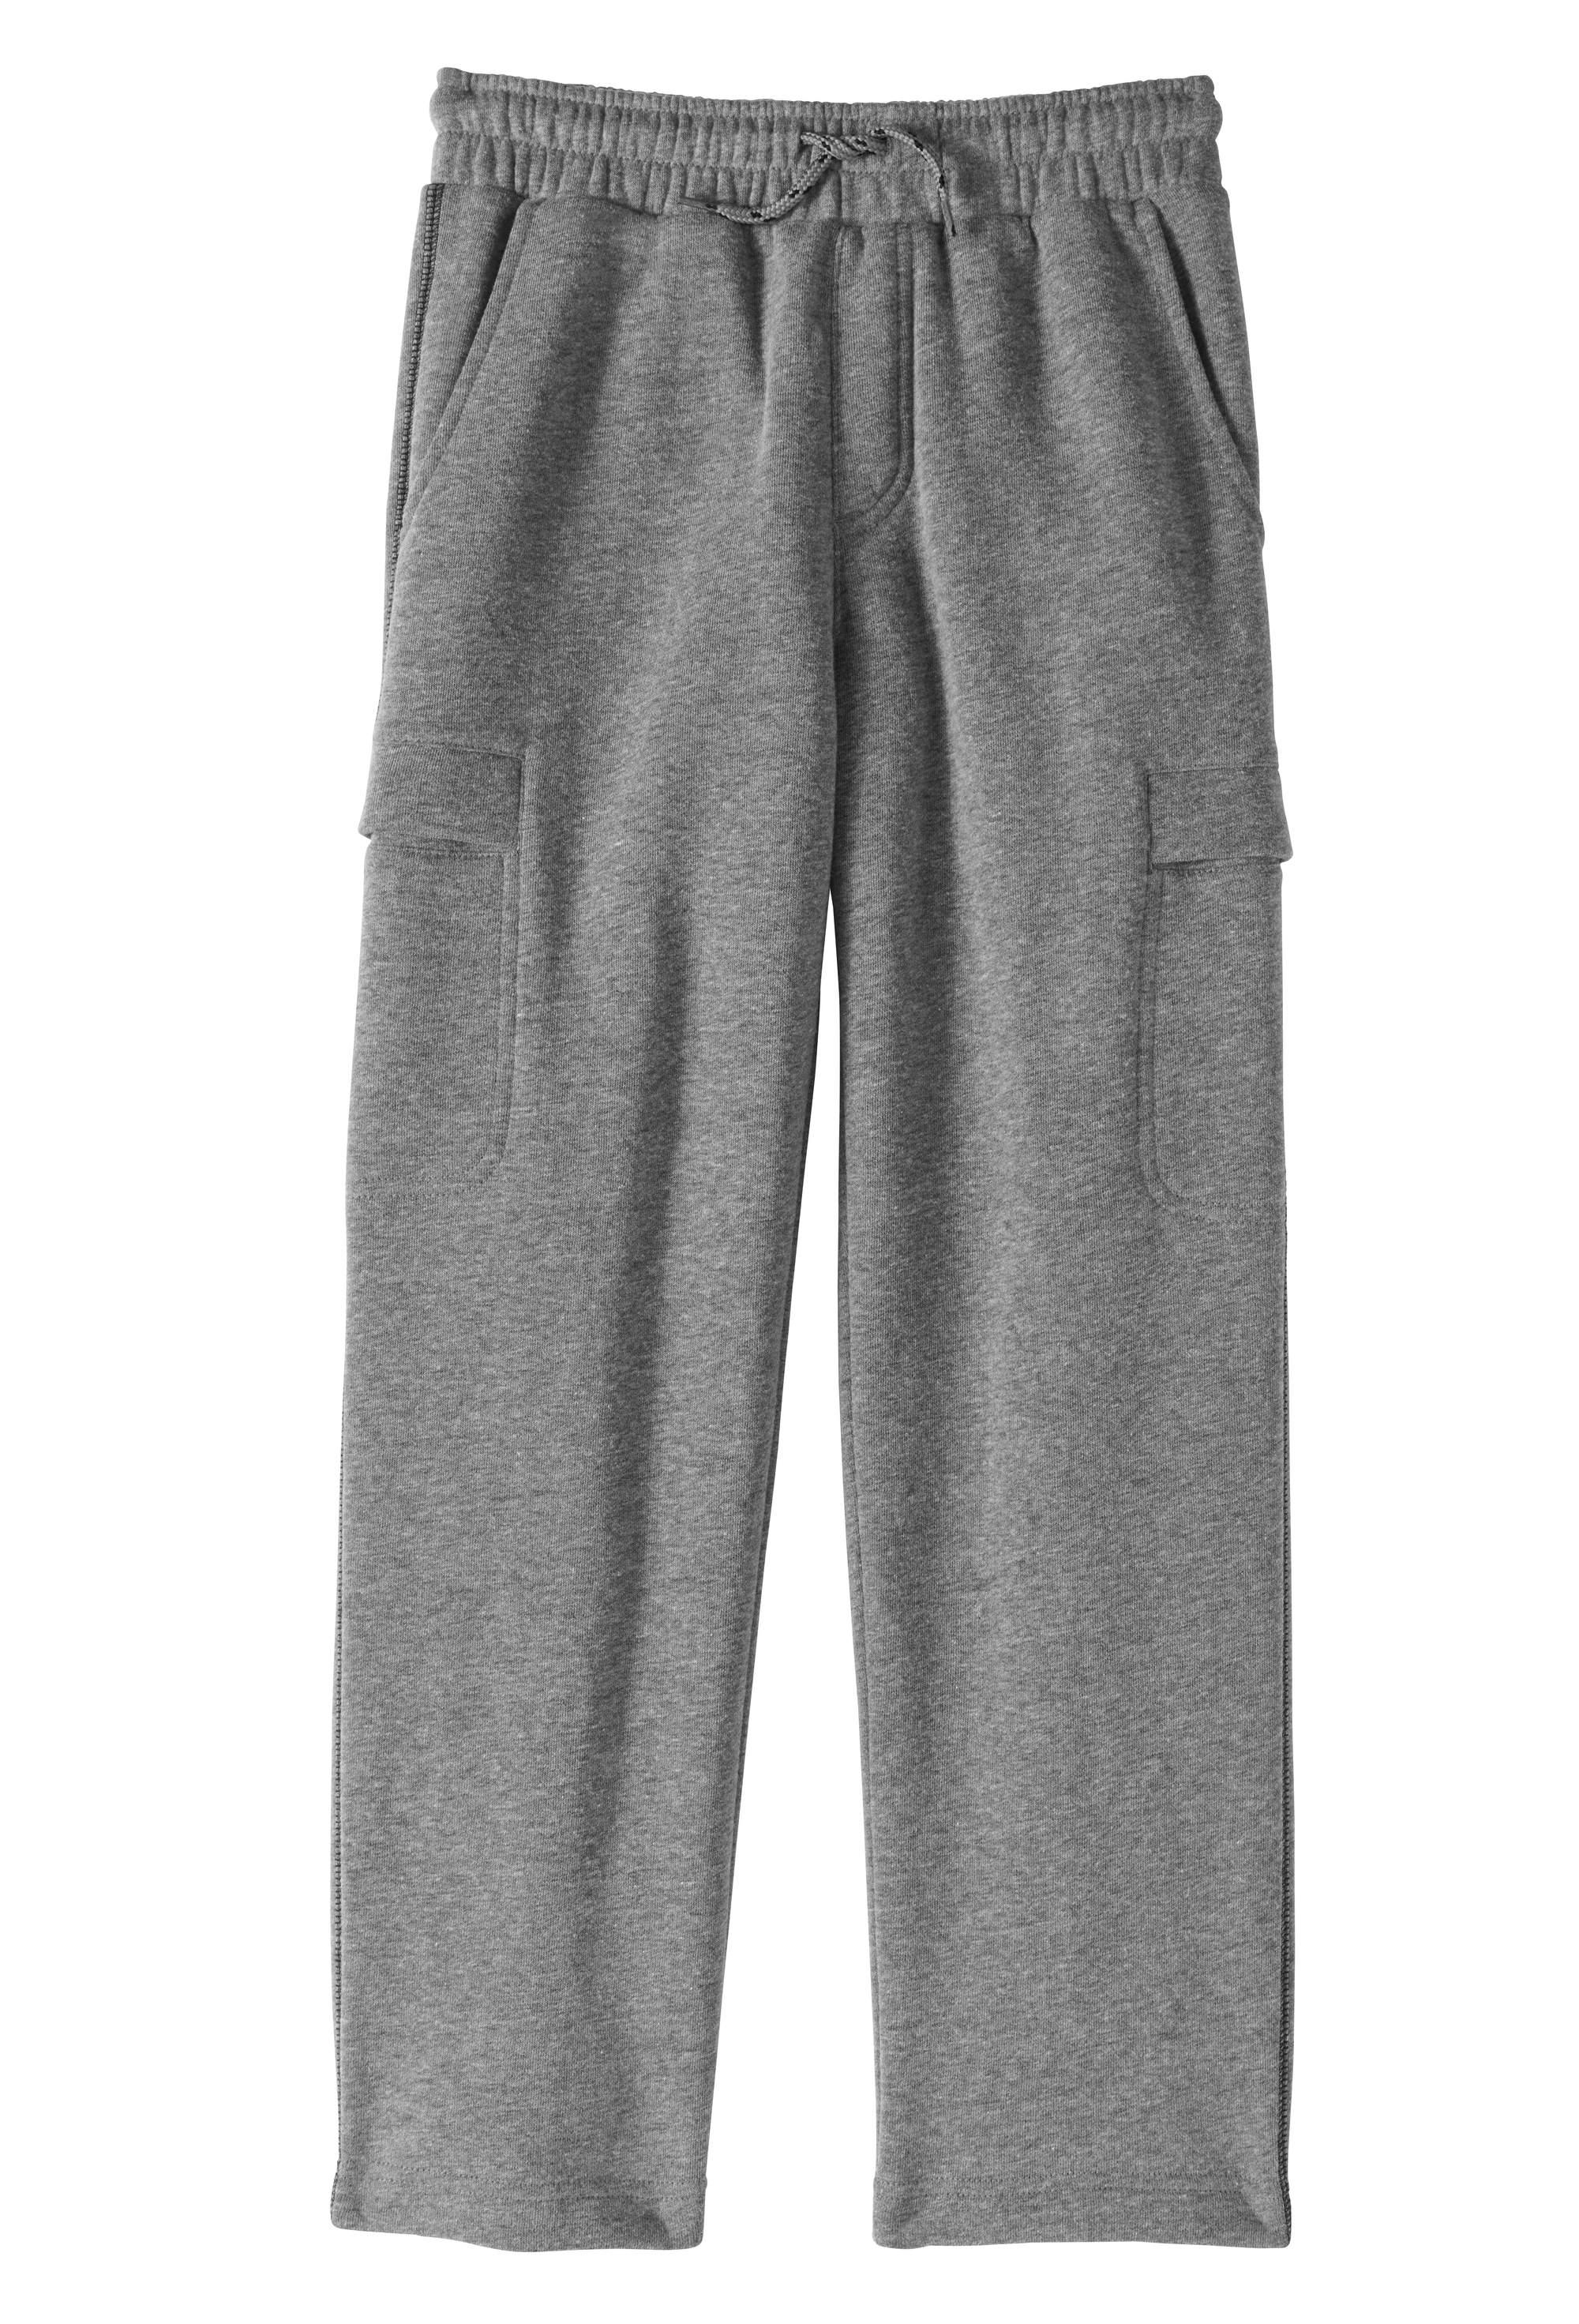 Boys' Fleece Cargo Pants